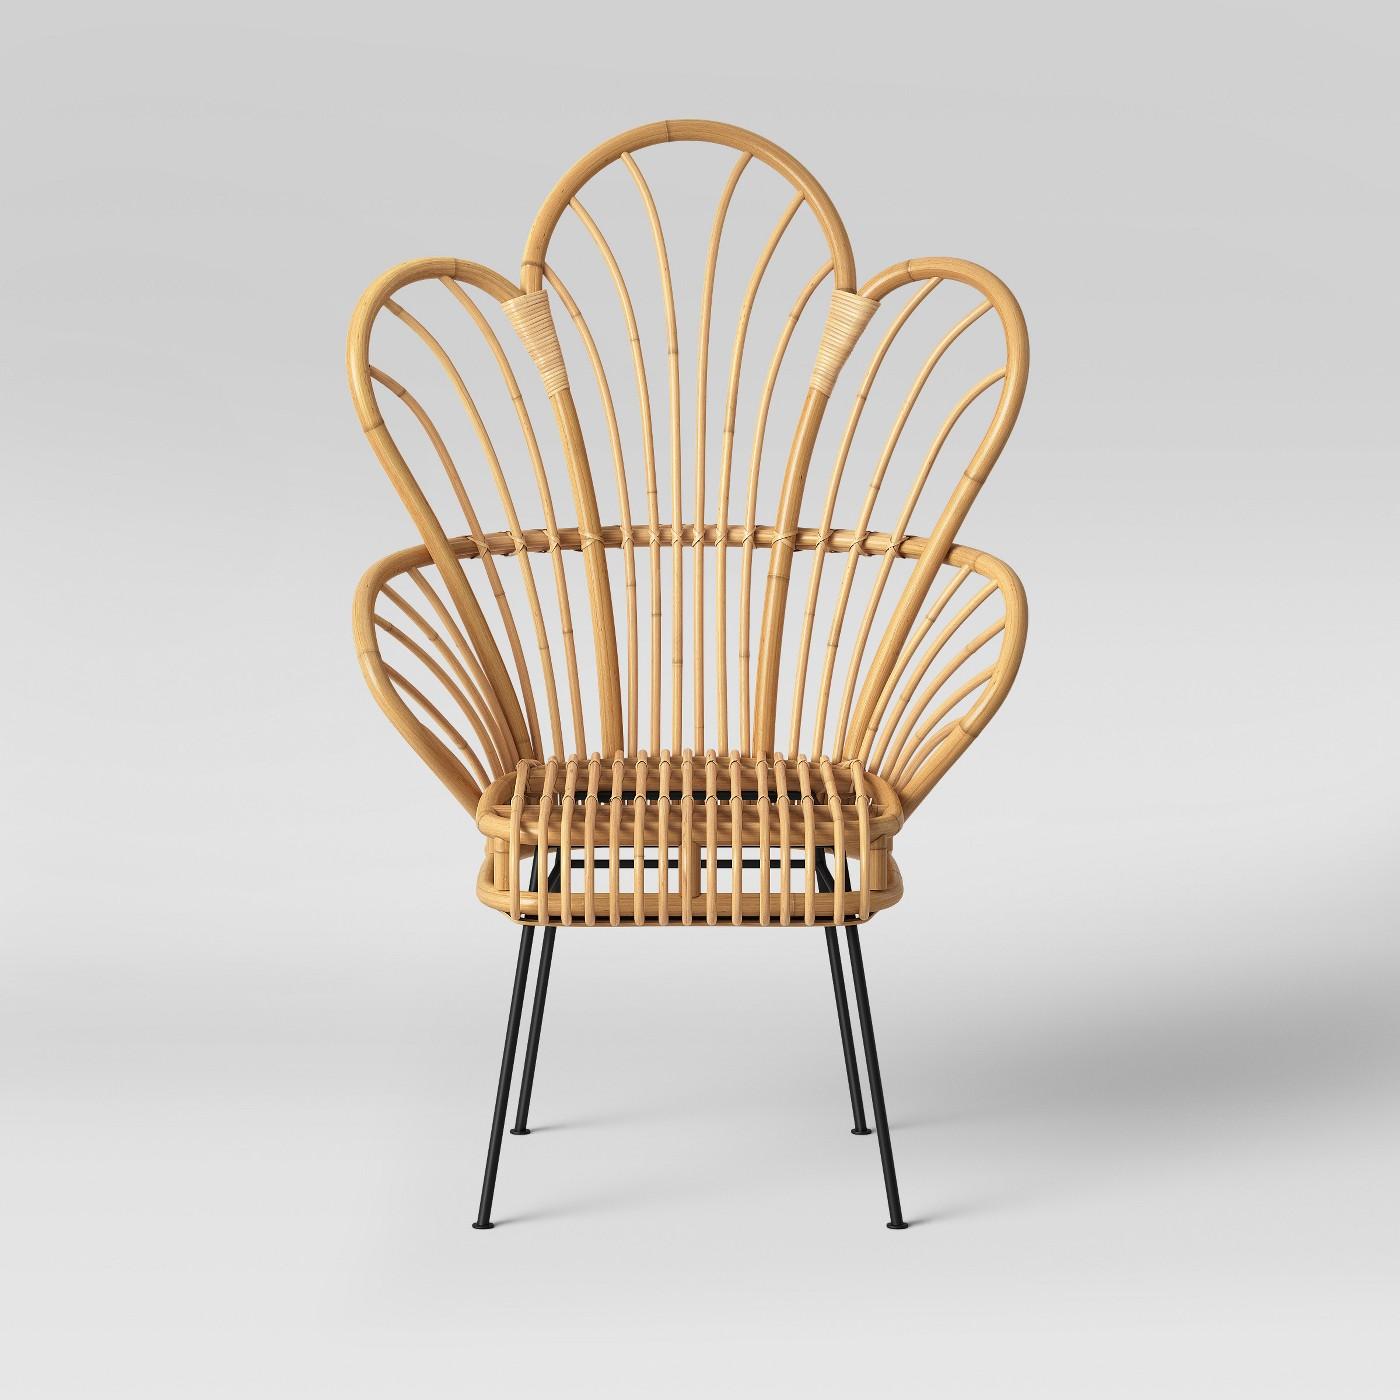 Malay Rattan Chair (2) $55